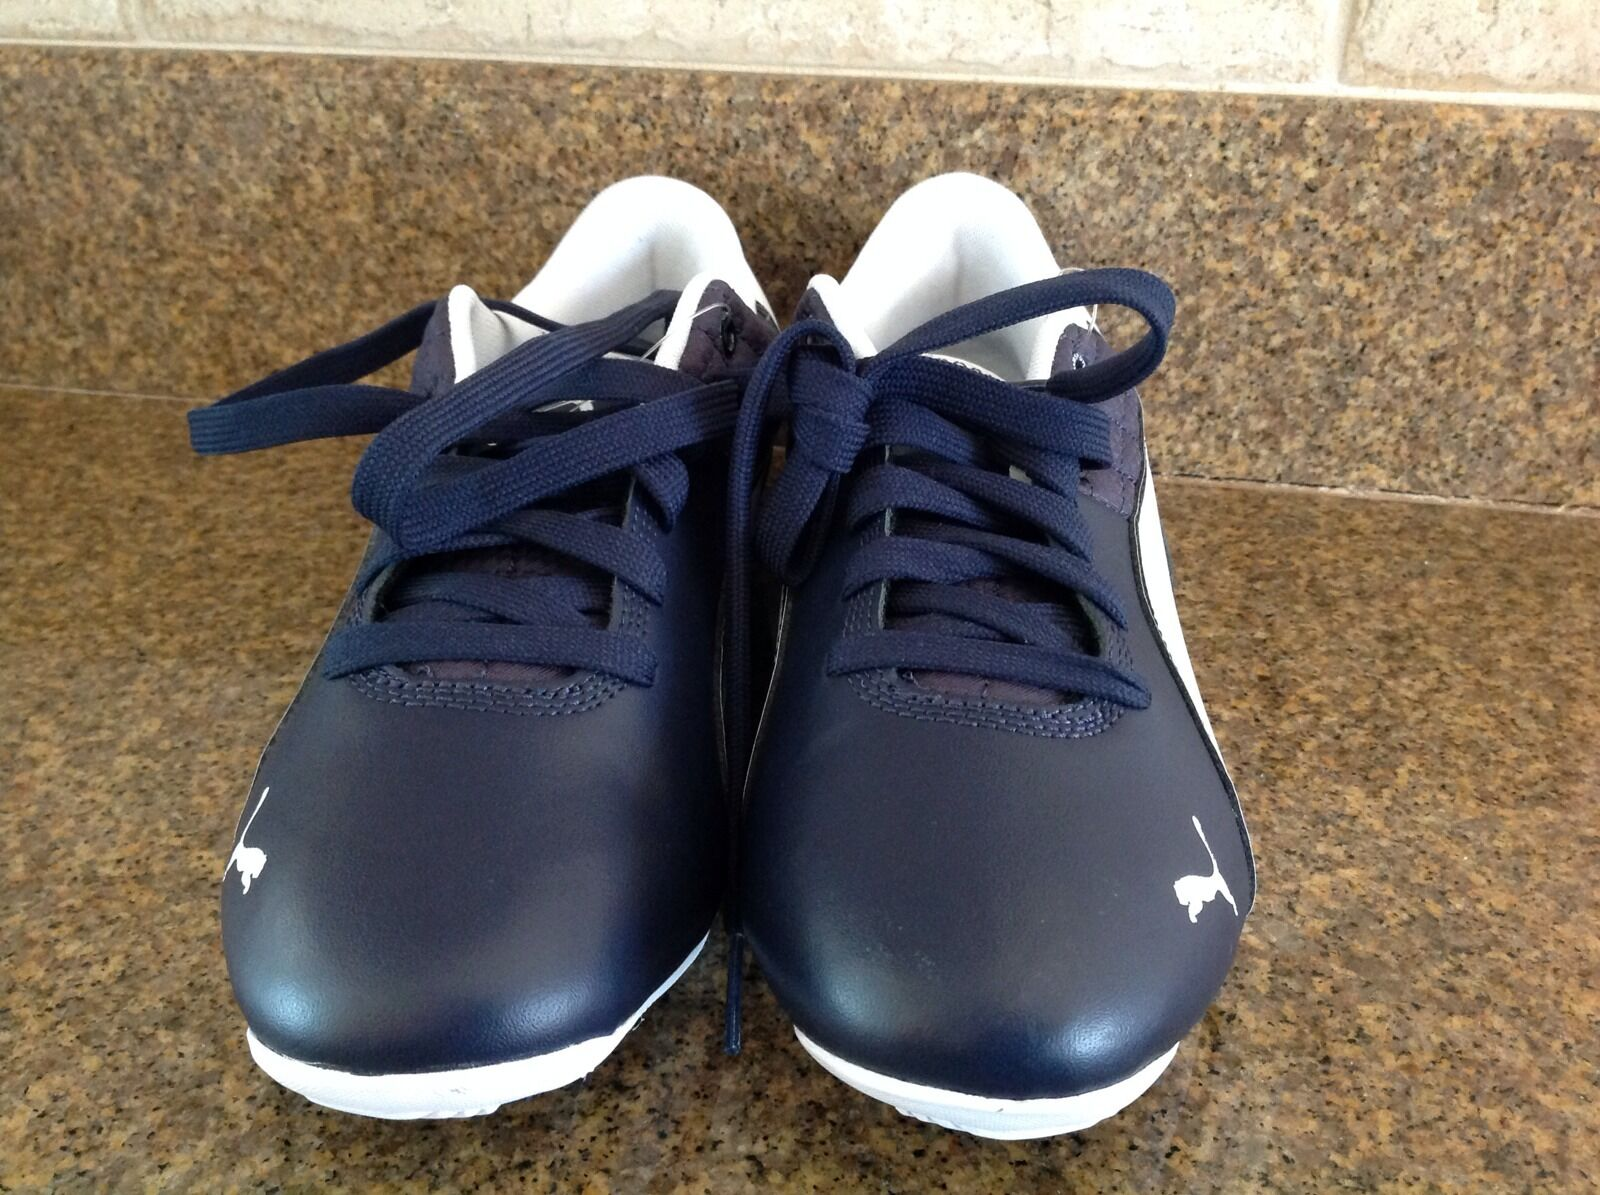 Scarpe casual da uomo Puma uomos Drift Cat 6 Peacoat/White/Navy Blue Leather Motorsport Sneakers US S.7